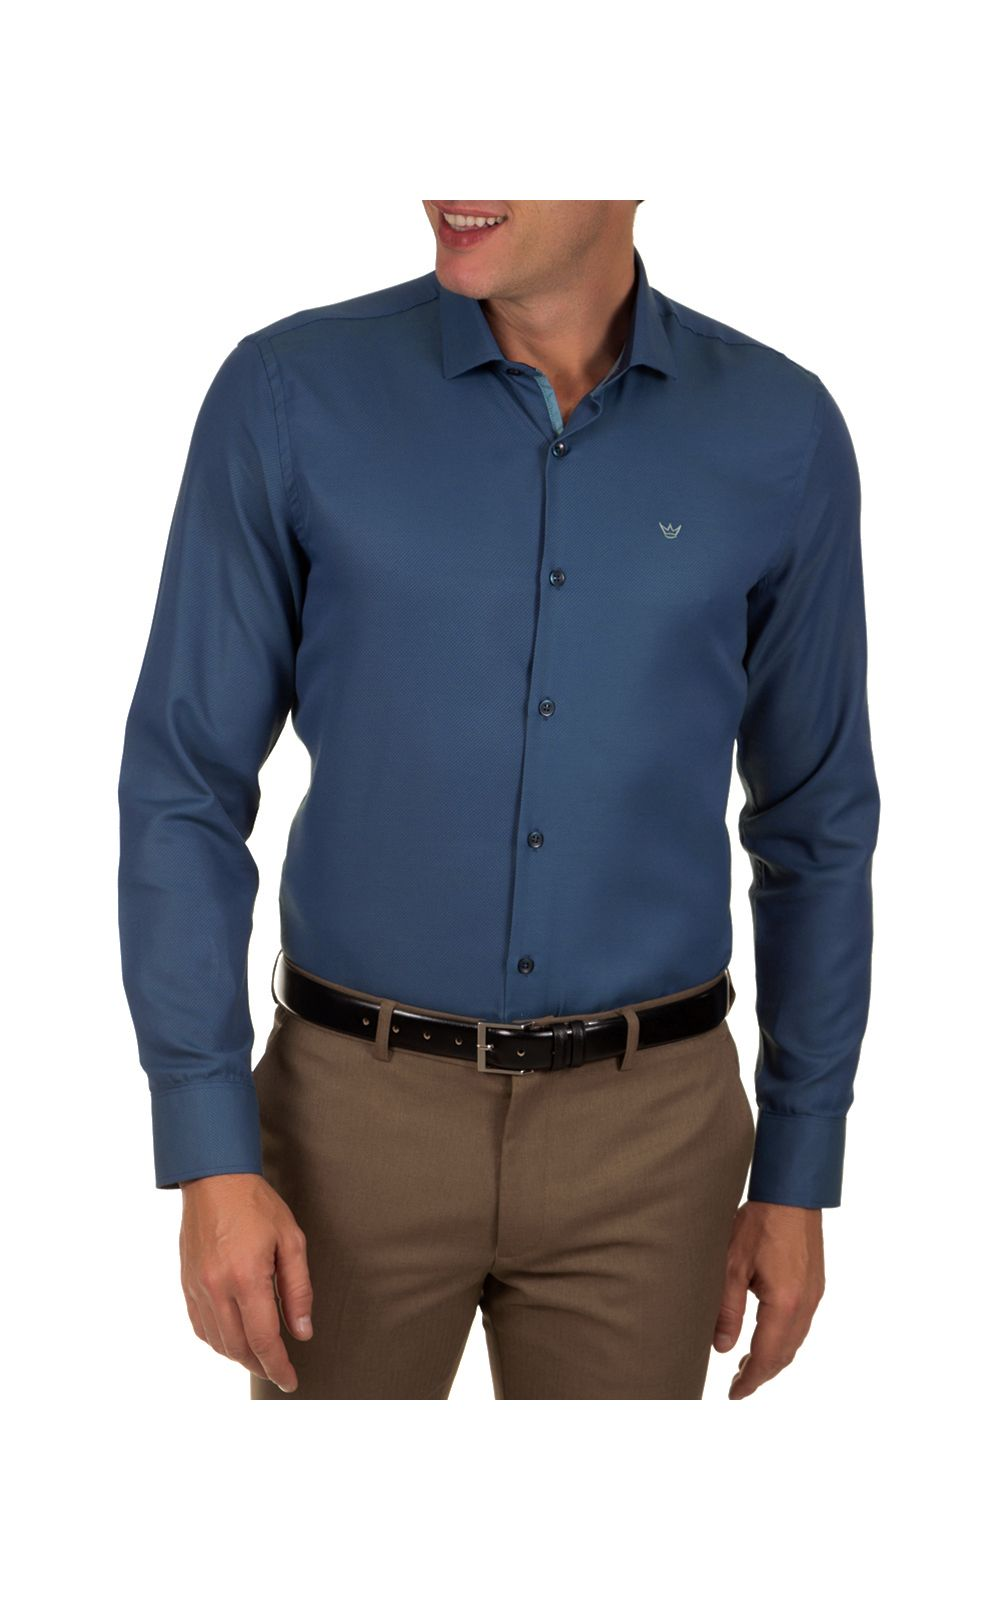 Foto 1 - Camisa Social Masculina Azul Escuro Lisa